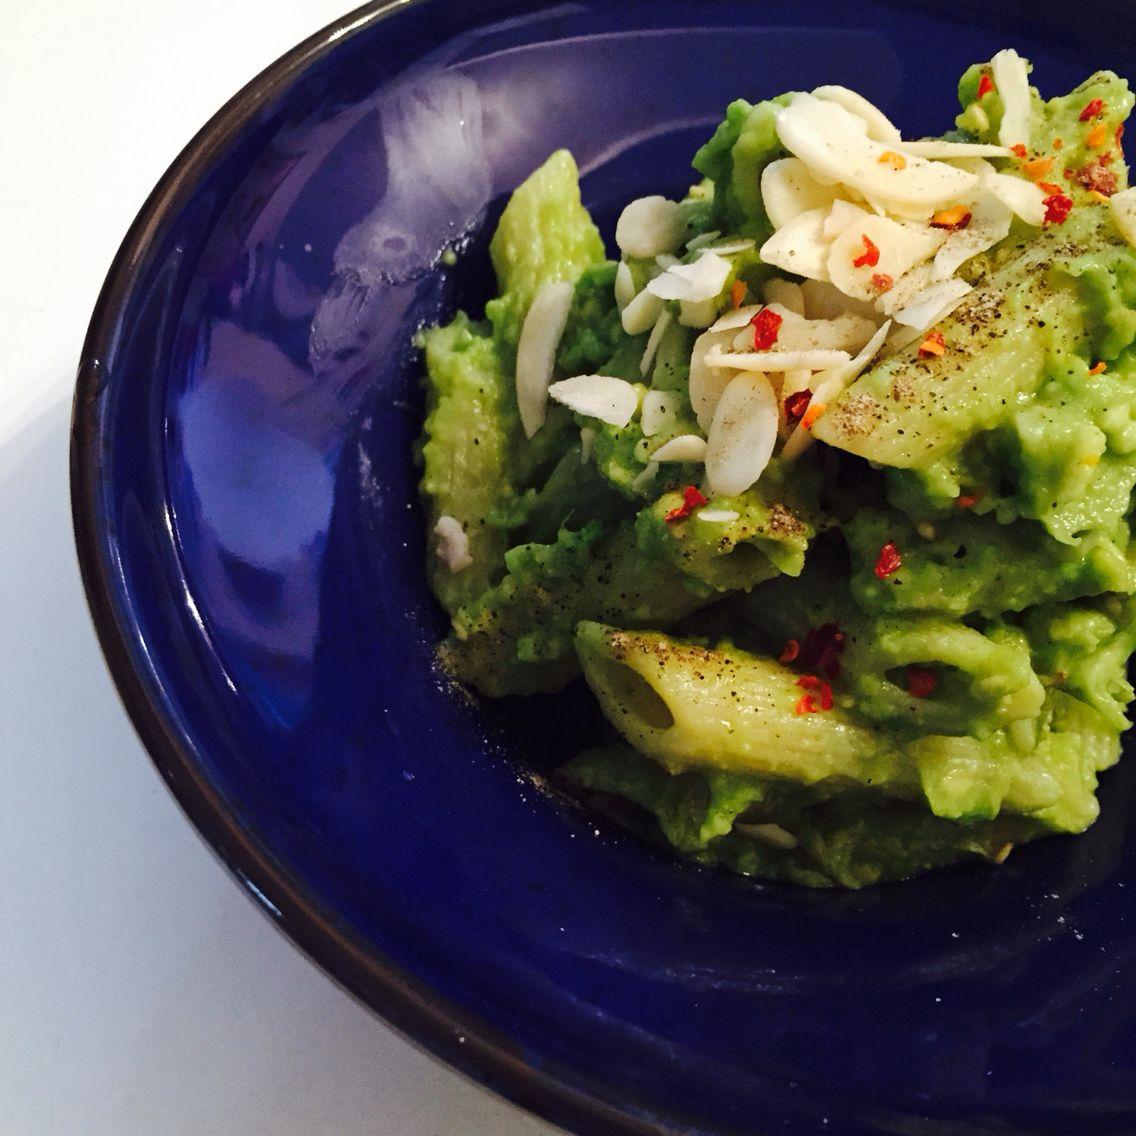 Another avocado dish! Pasta